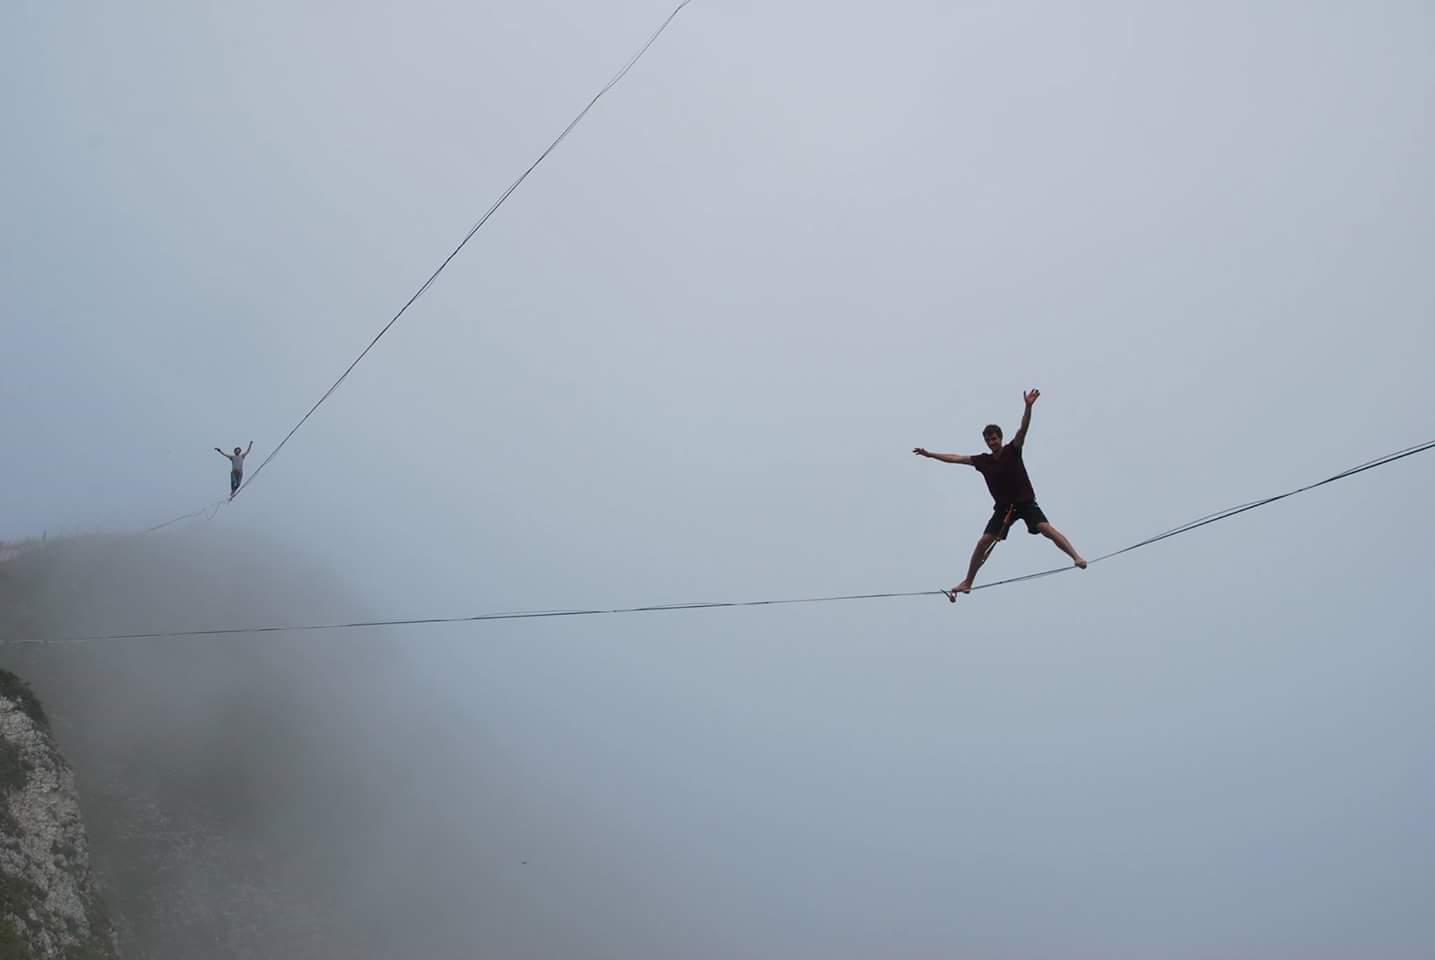 Moleson gruyere suisse Slackline Lyell Grunberg show performance spectacle Highline trickline.jpg